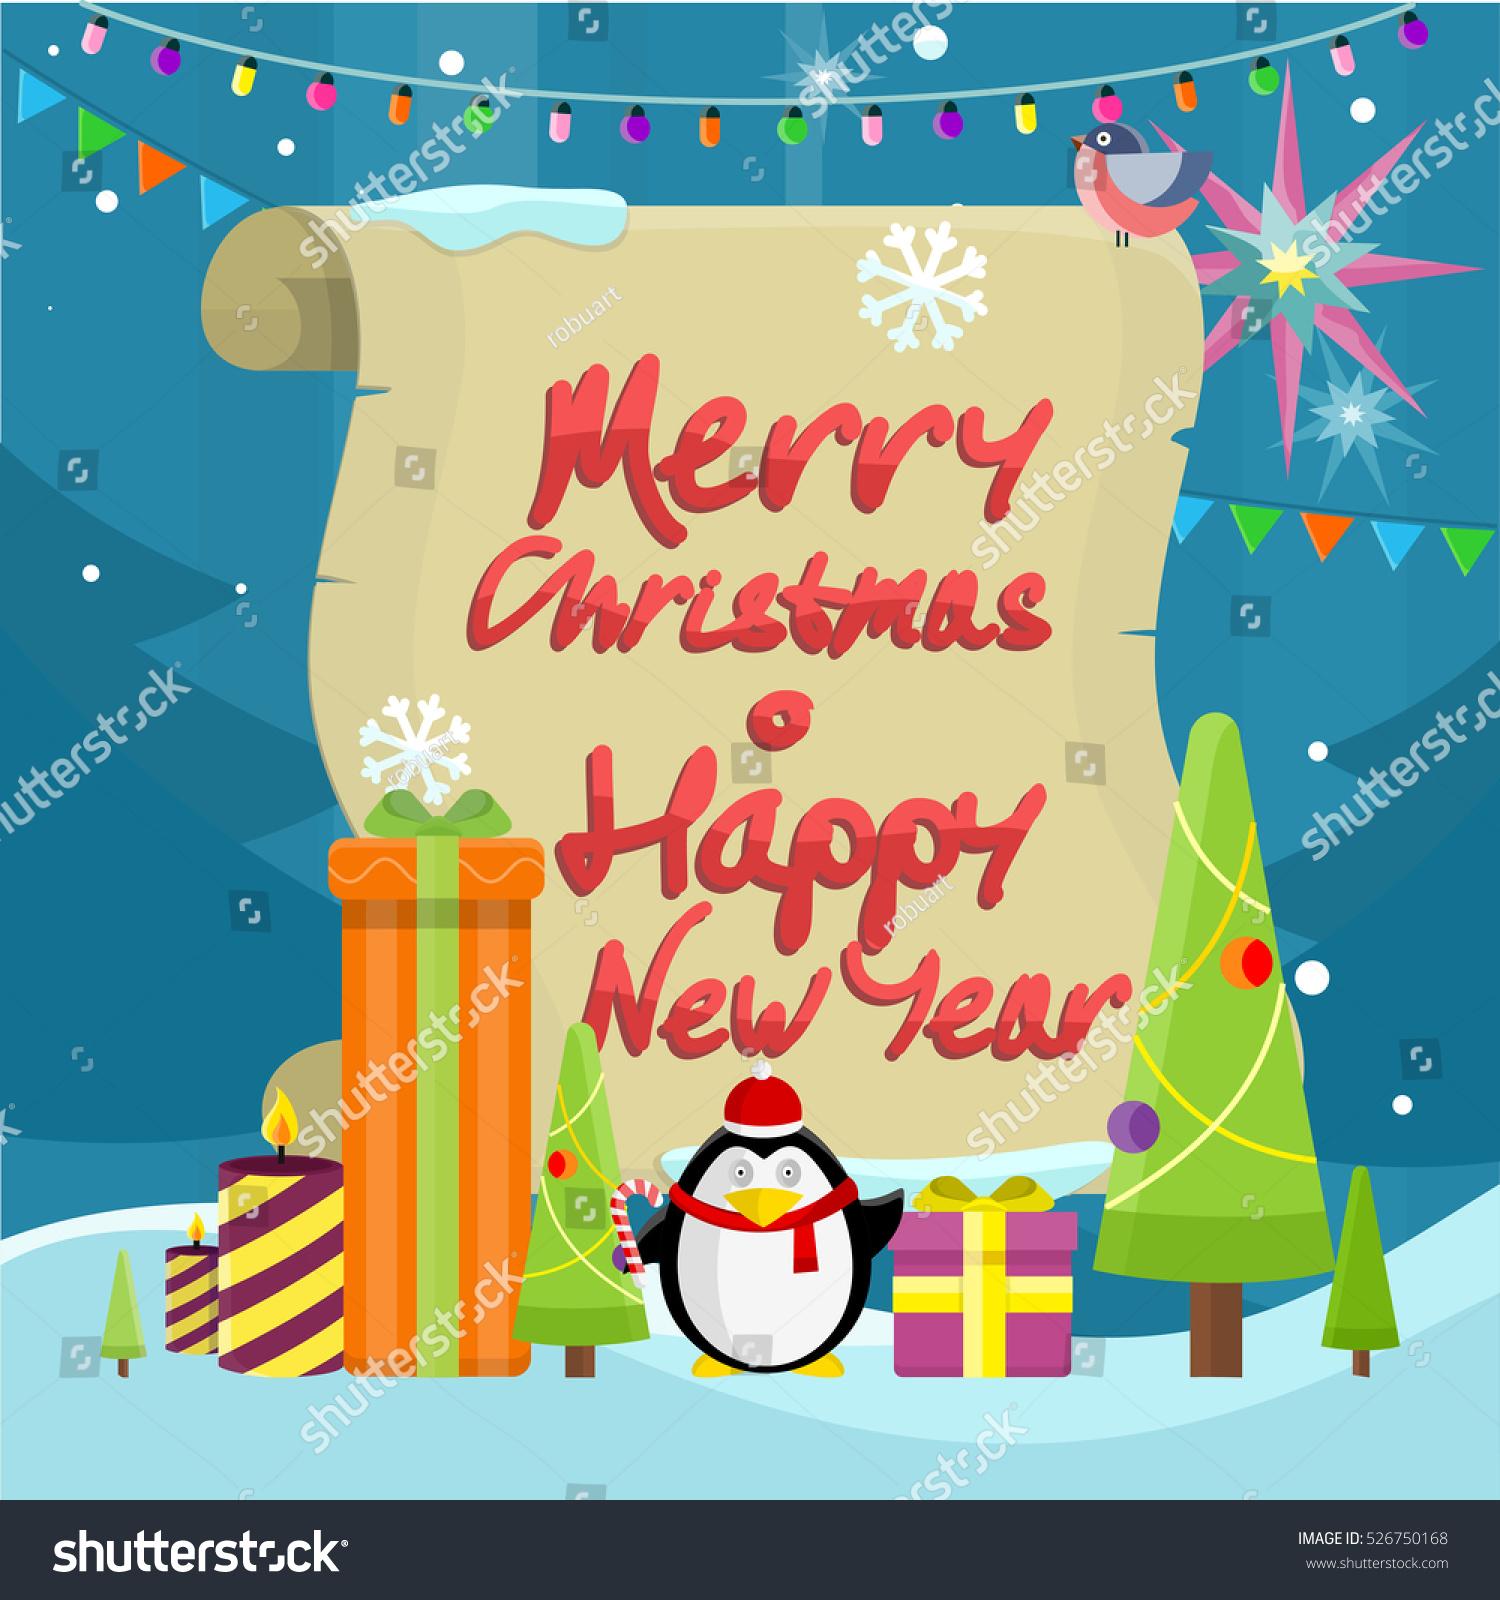 71c6545f38b31 Winter holidays symbols concept. Flat design. Christmas tree with toys